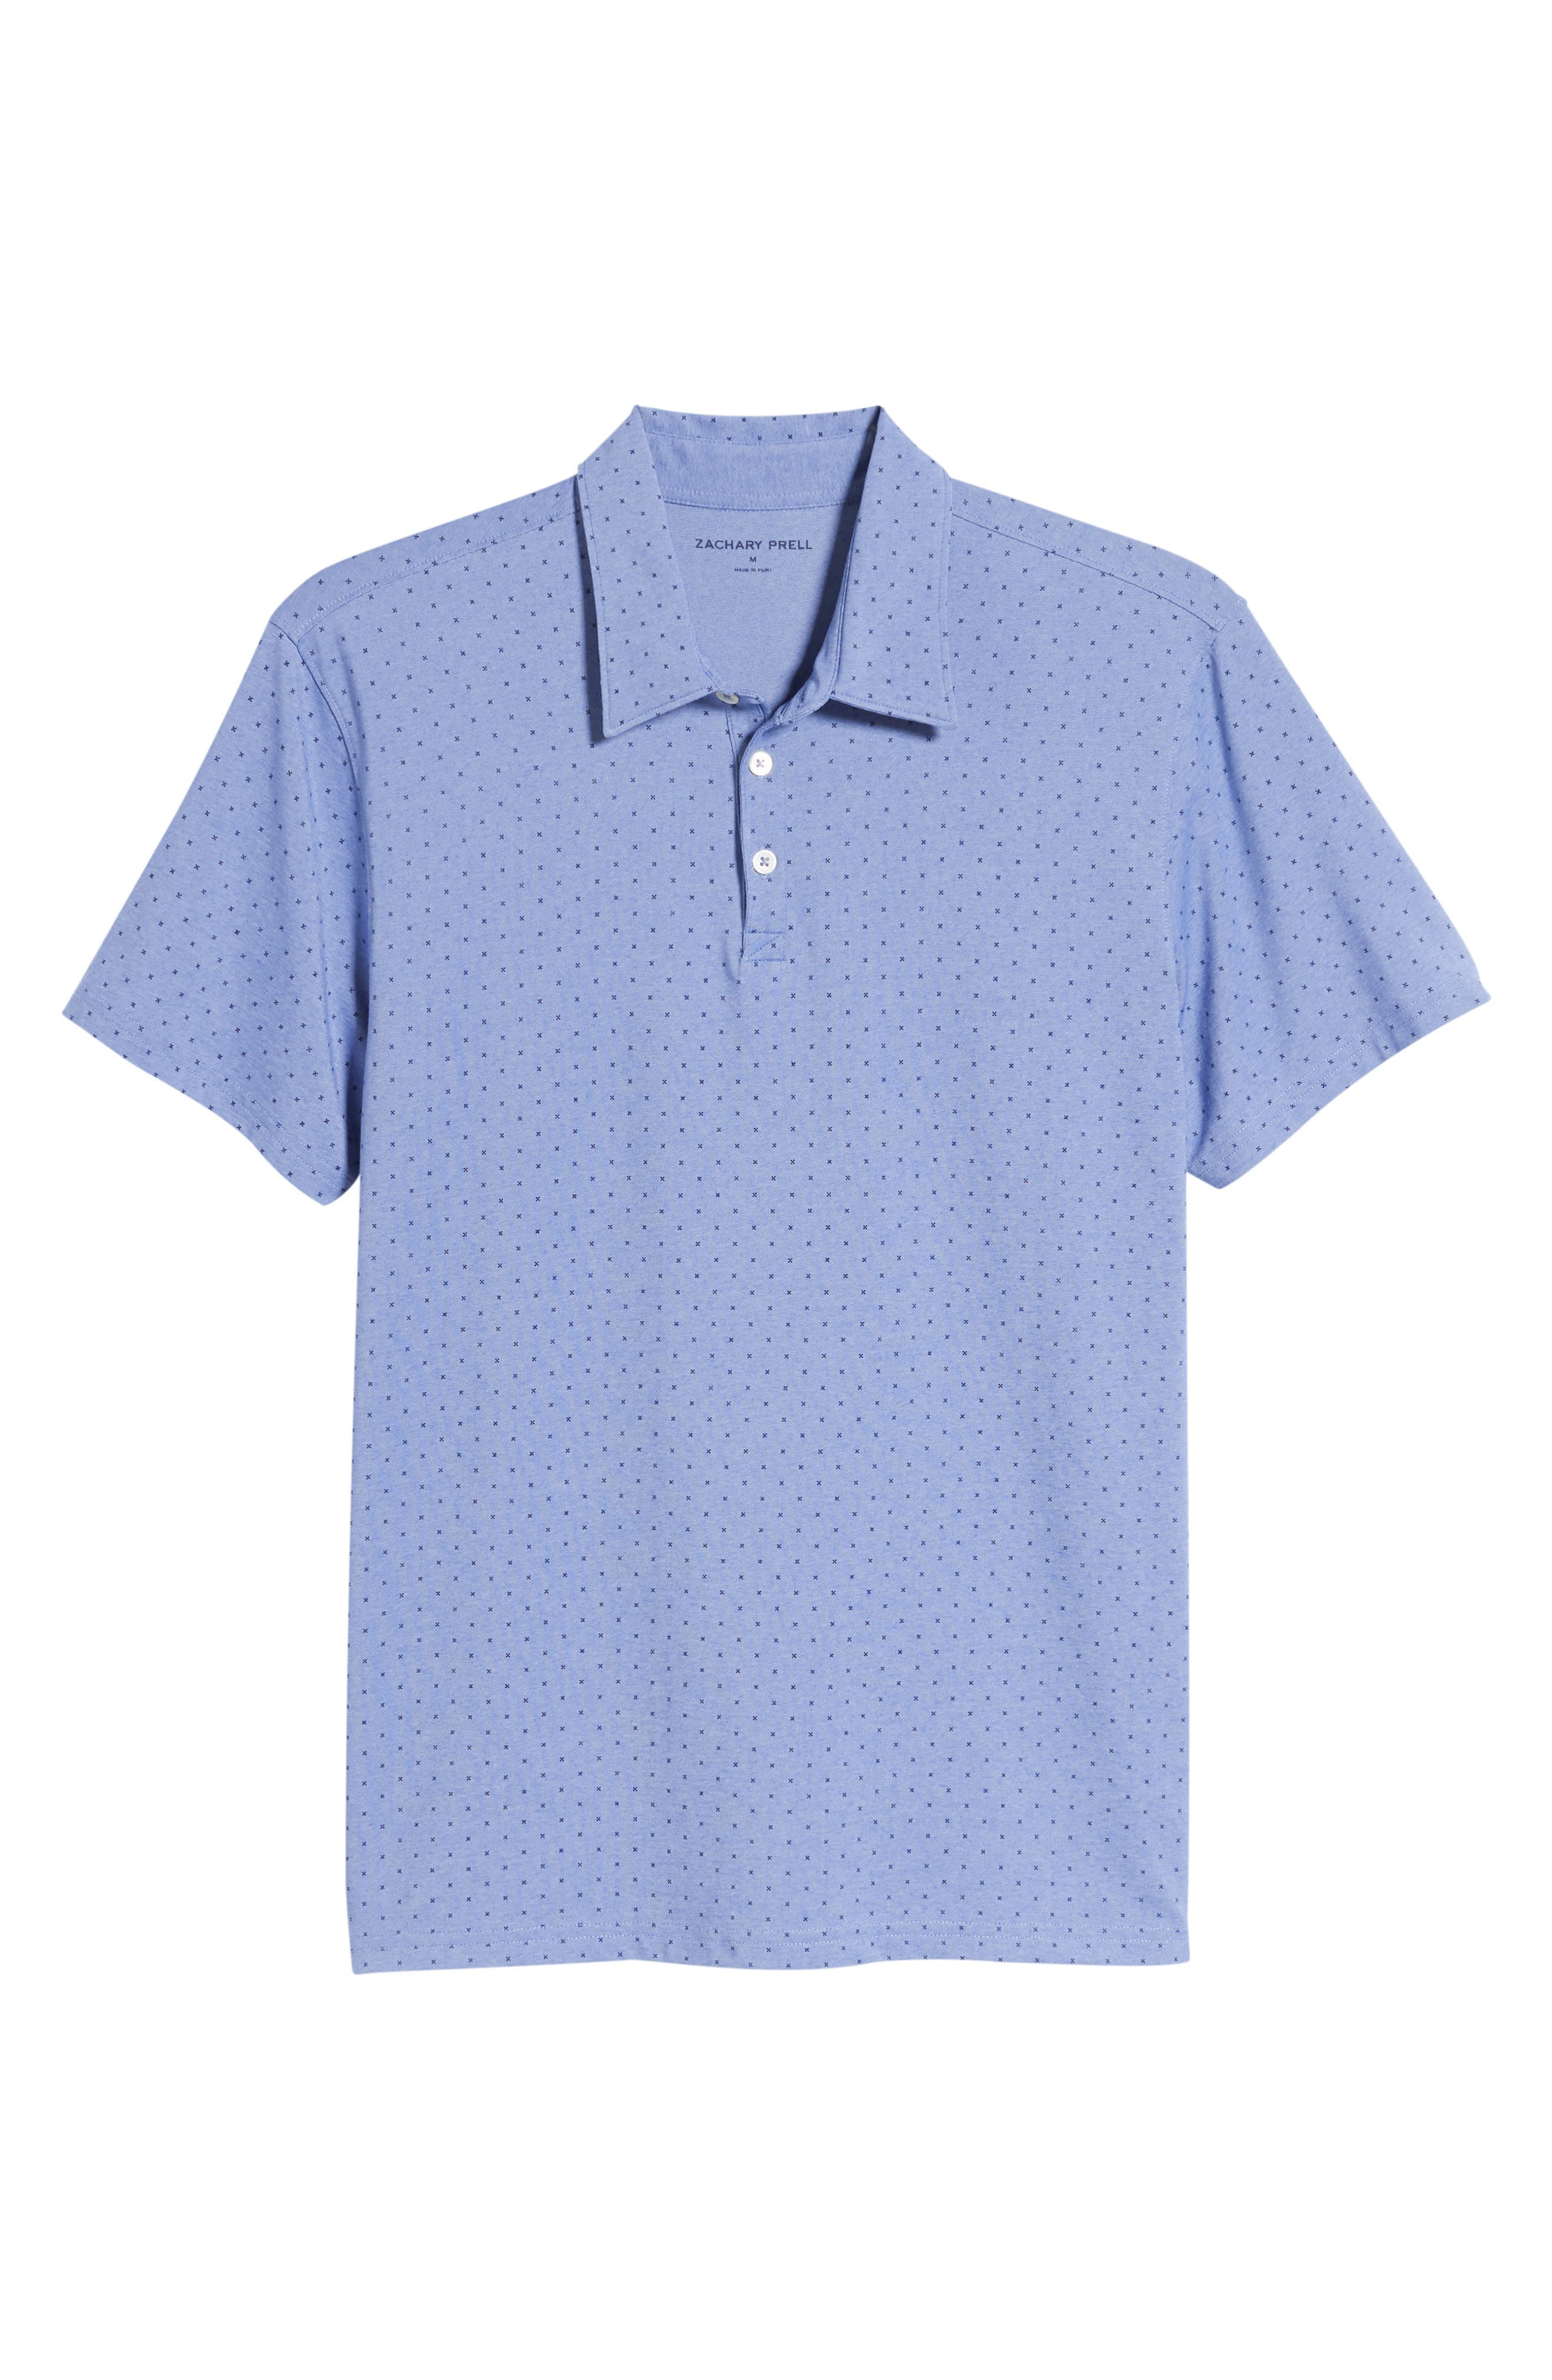 ZACHARY PRELL, Bayville Regular Fit Dobby Polo, Alternate thumbnail 6, color, LT BLUE